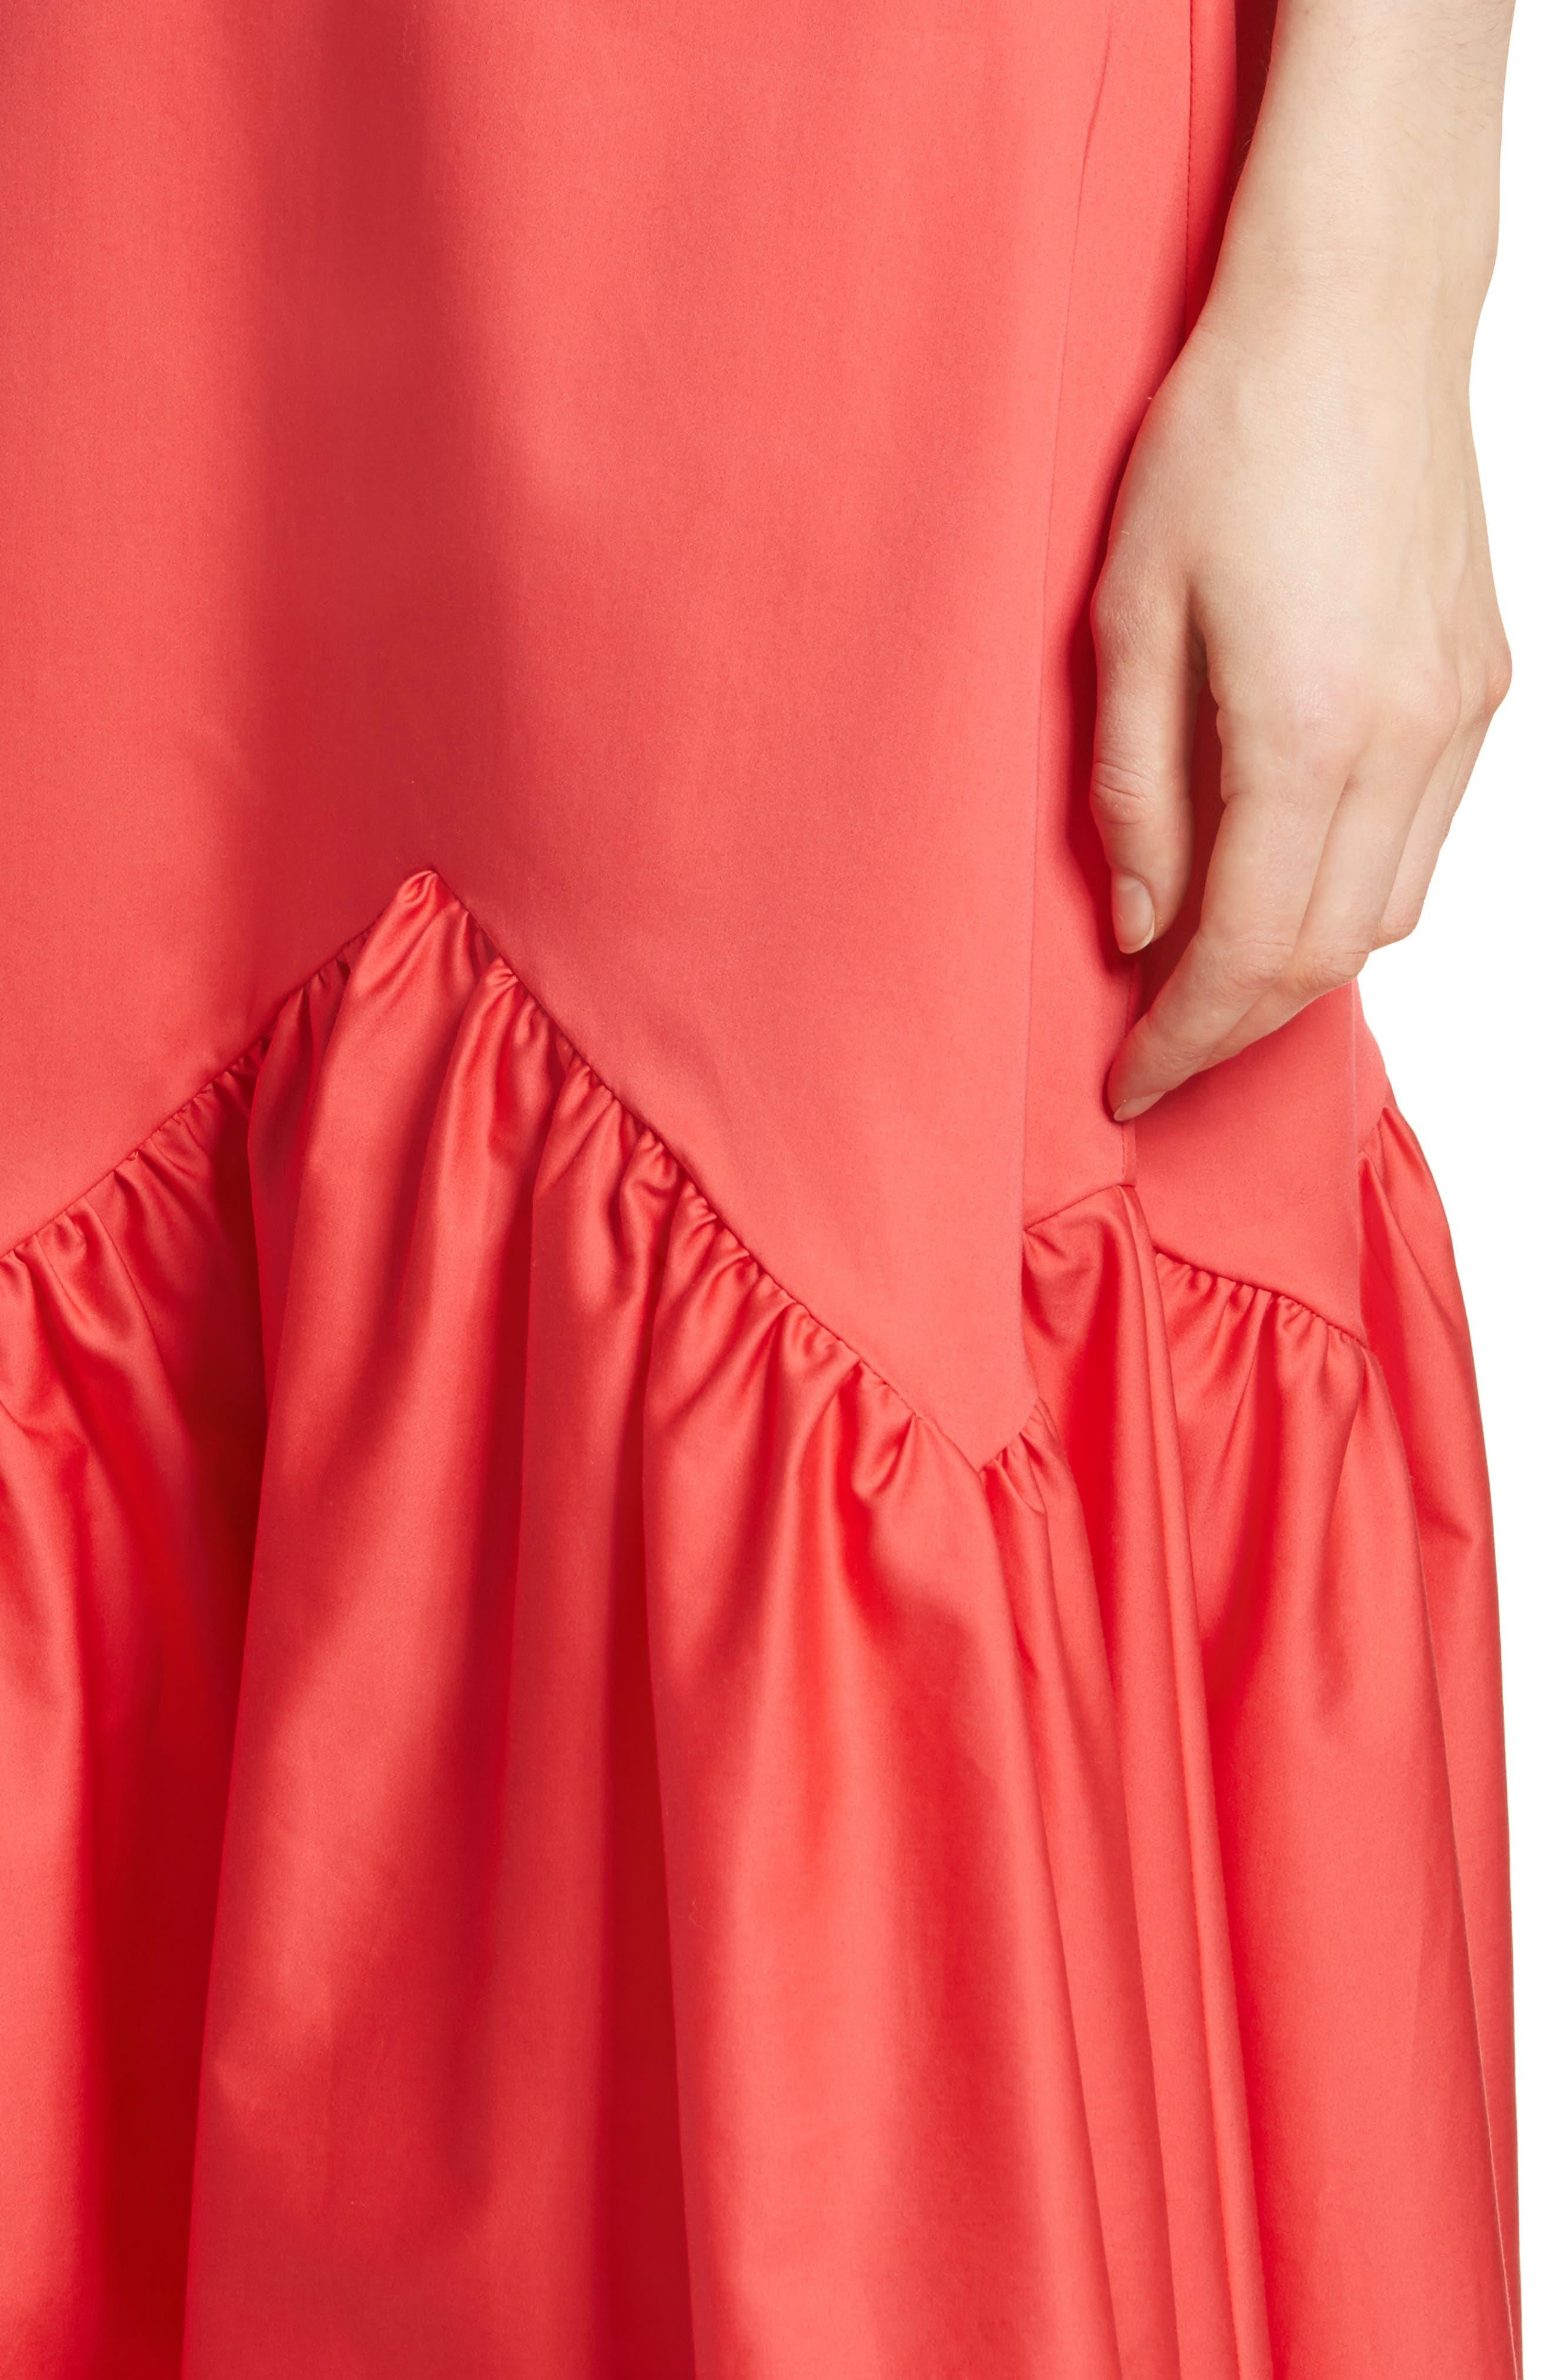 Prose & Poetry Tyra Midi Skirt,                             Alternate thumbnail 4, color,                             Watermelon